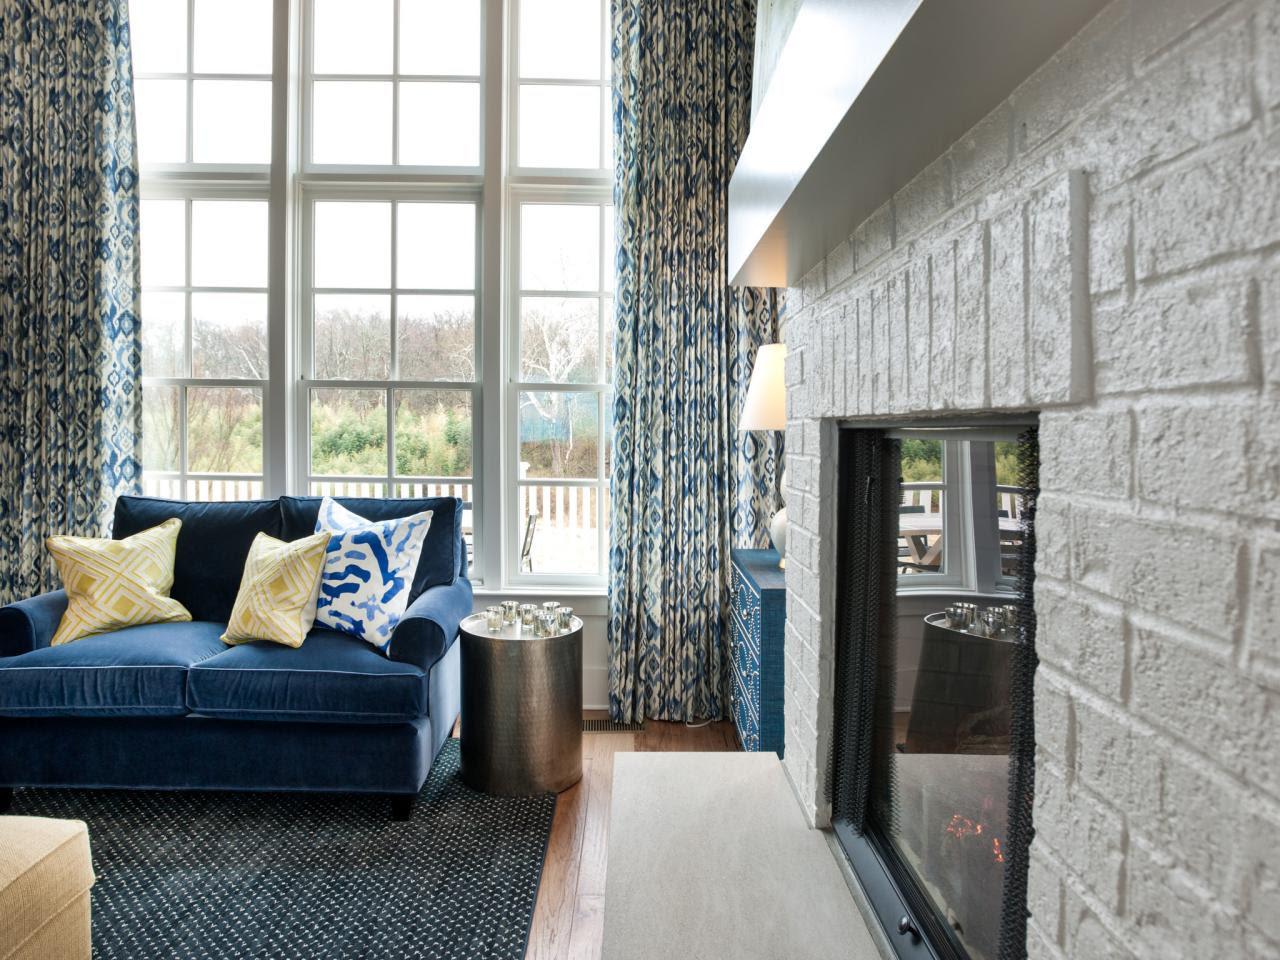 Large Kitchen Window Treatments: HGTV Pictures & Ideas | HGTV